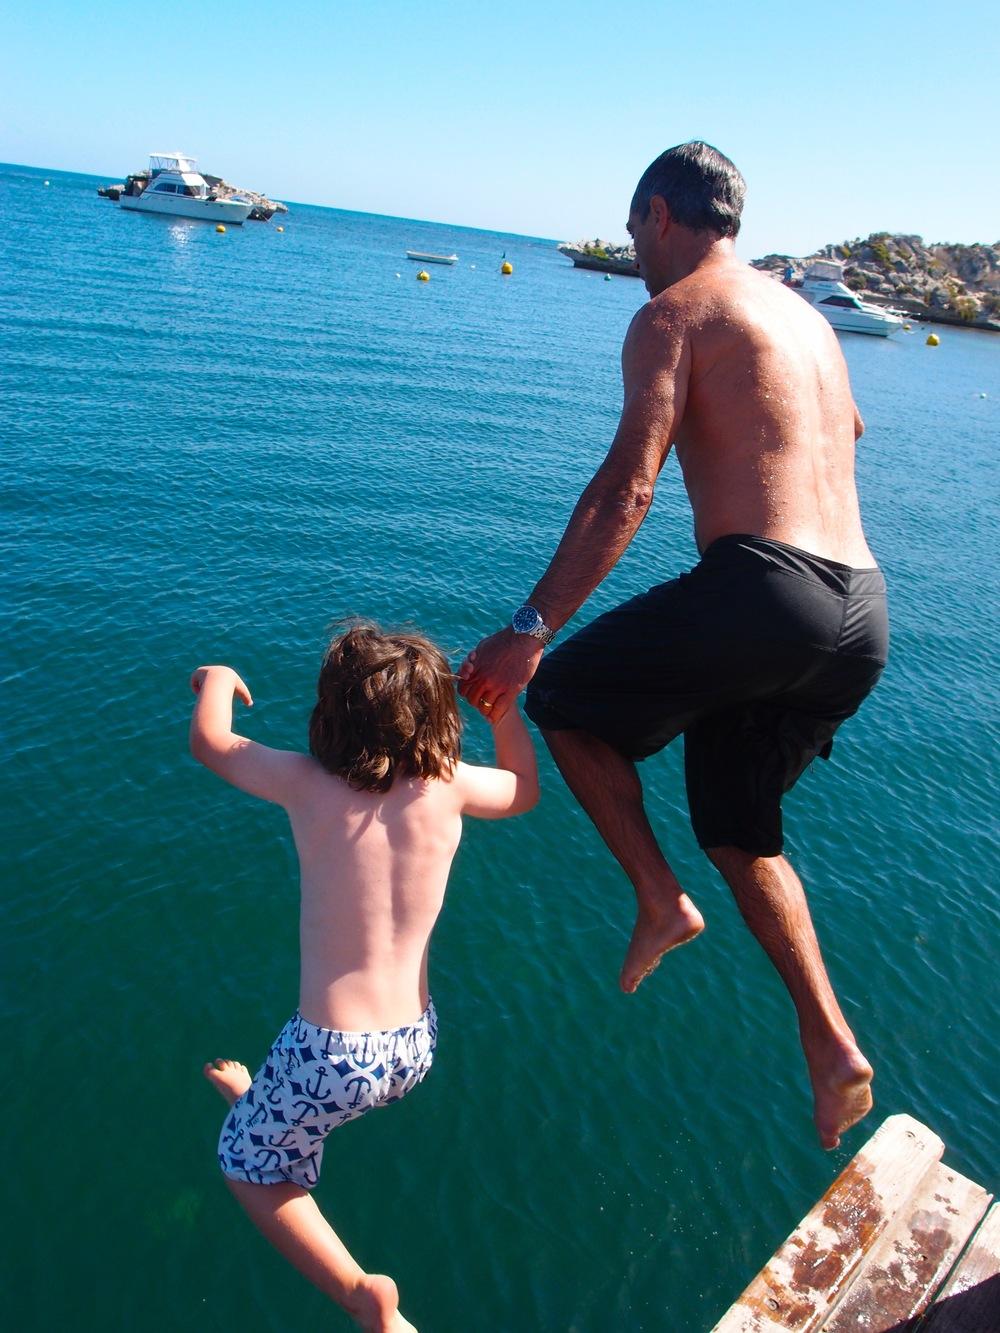 Jumping into Geordie Bay - Rottnest Island, Western Australia